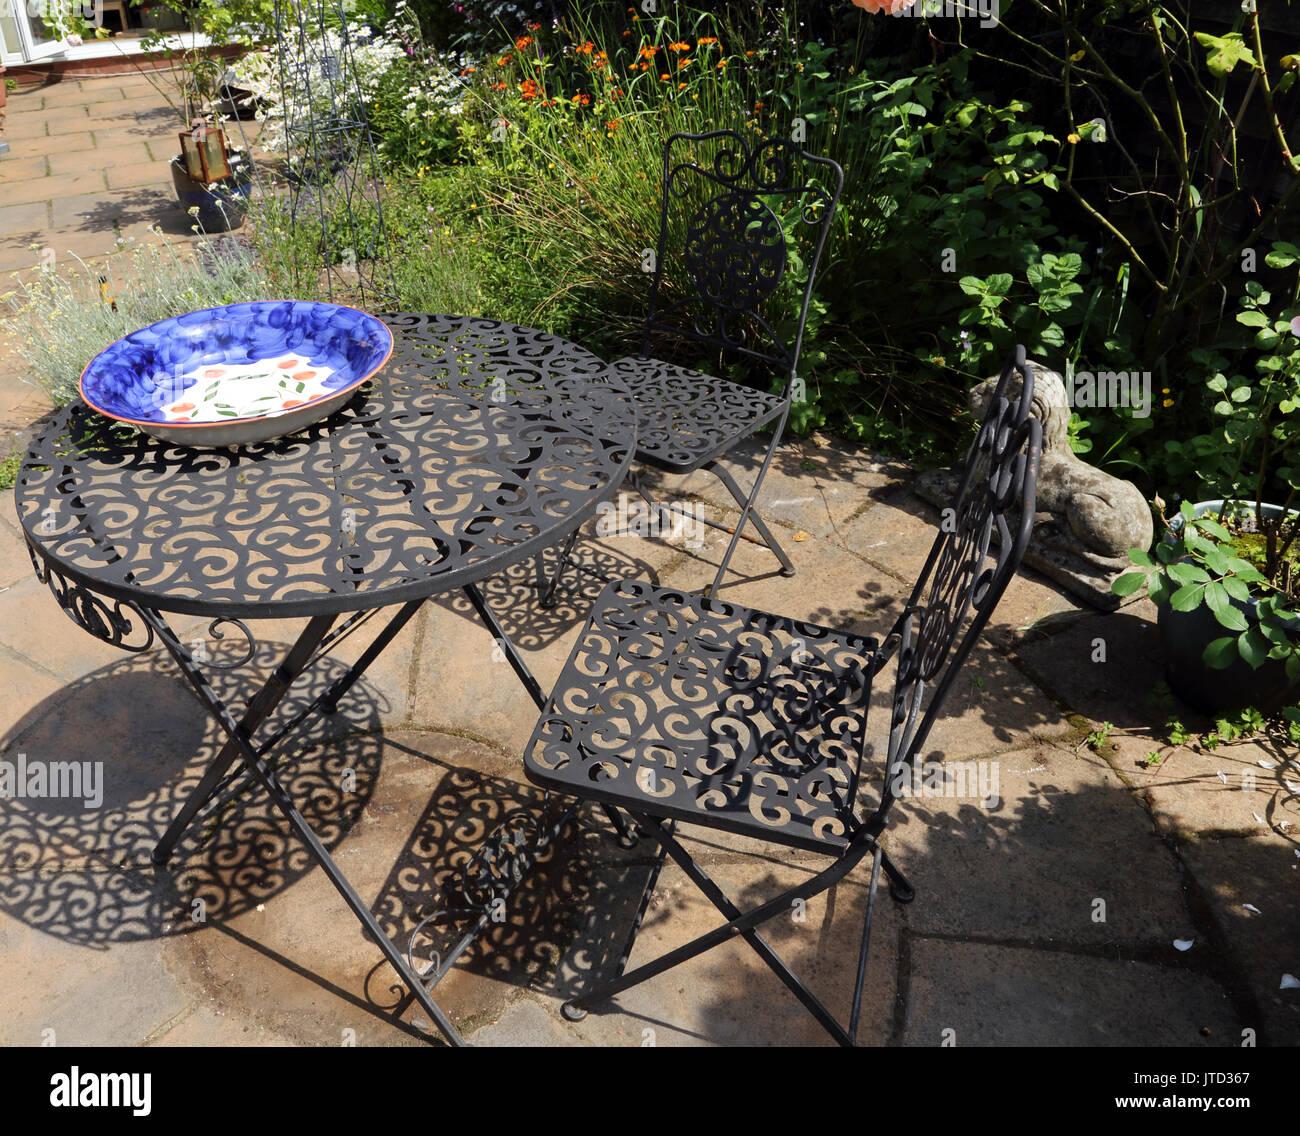 Stock Photo   Wrought Iron Garden Furniture And Shadows In Summer Birmingham  West Midlands England